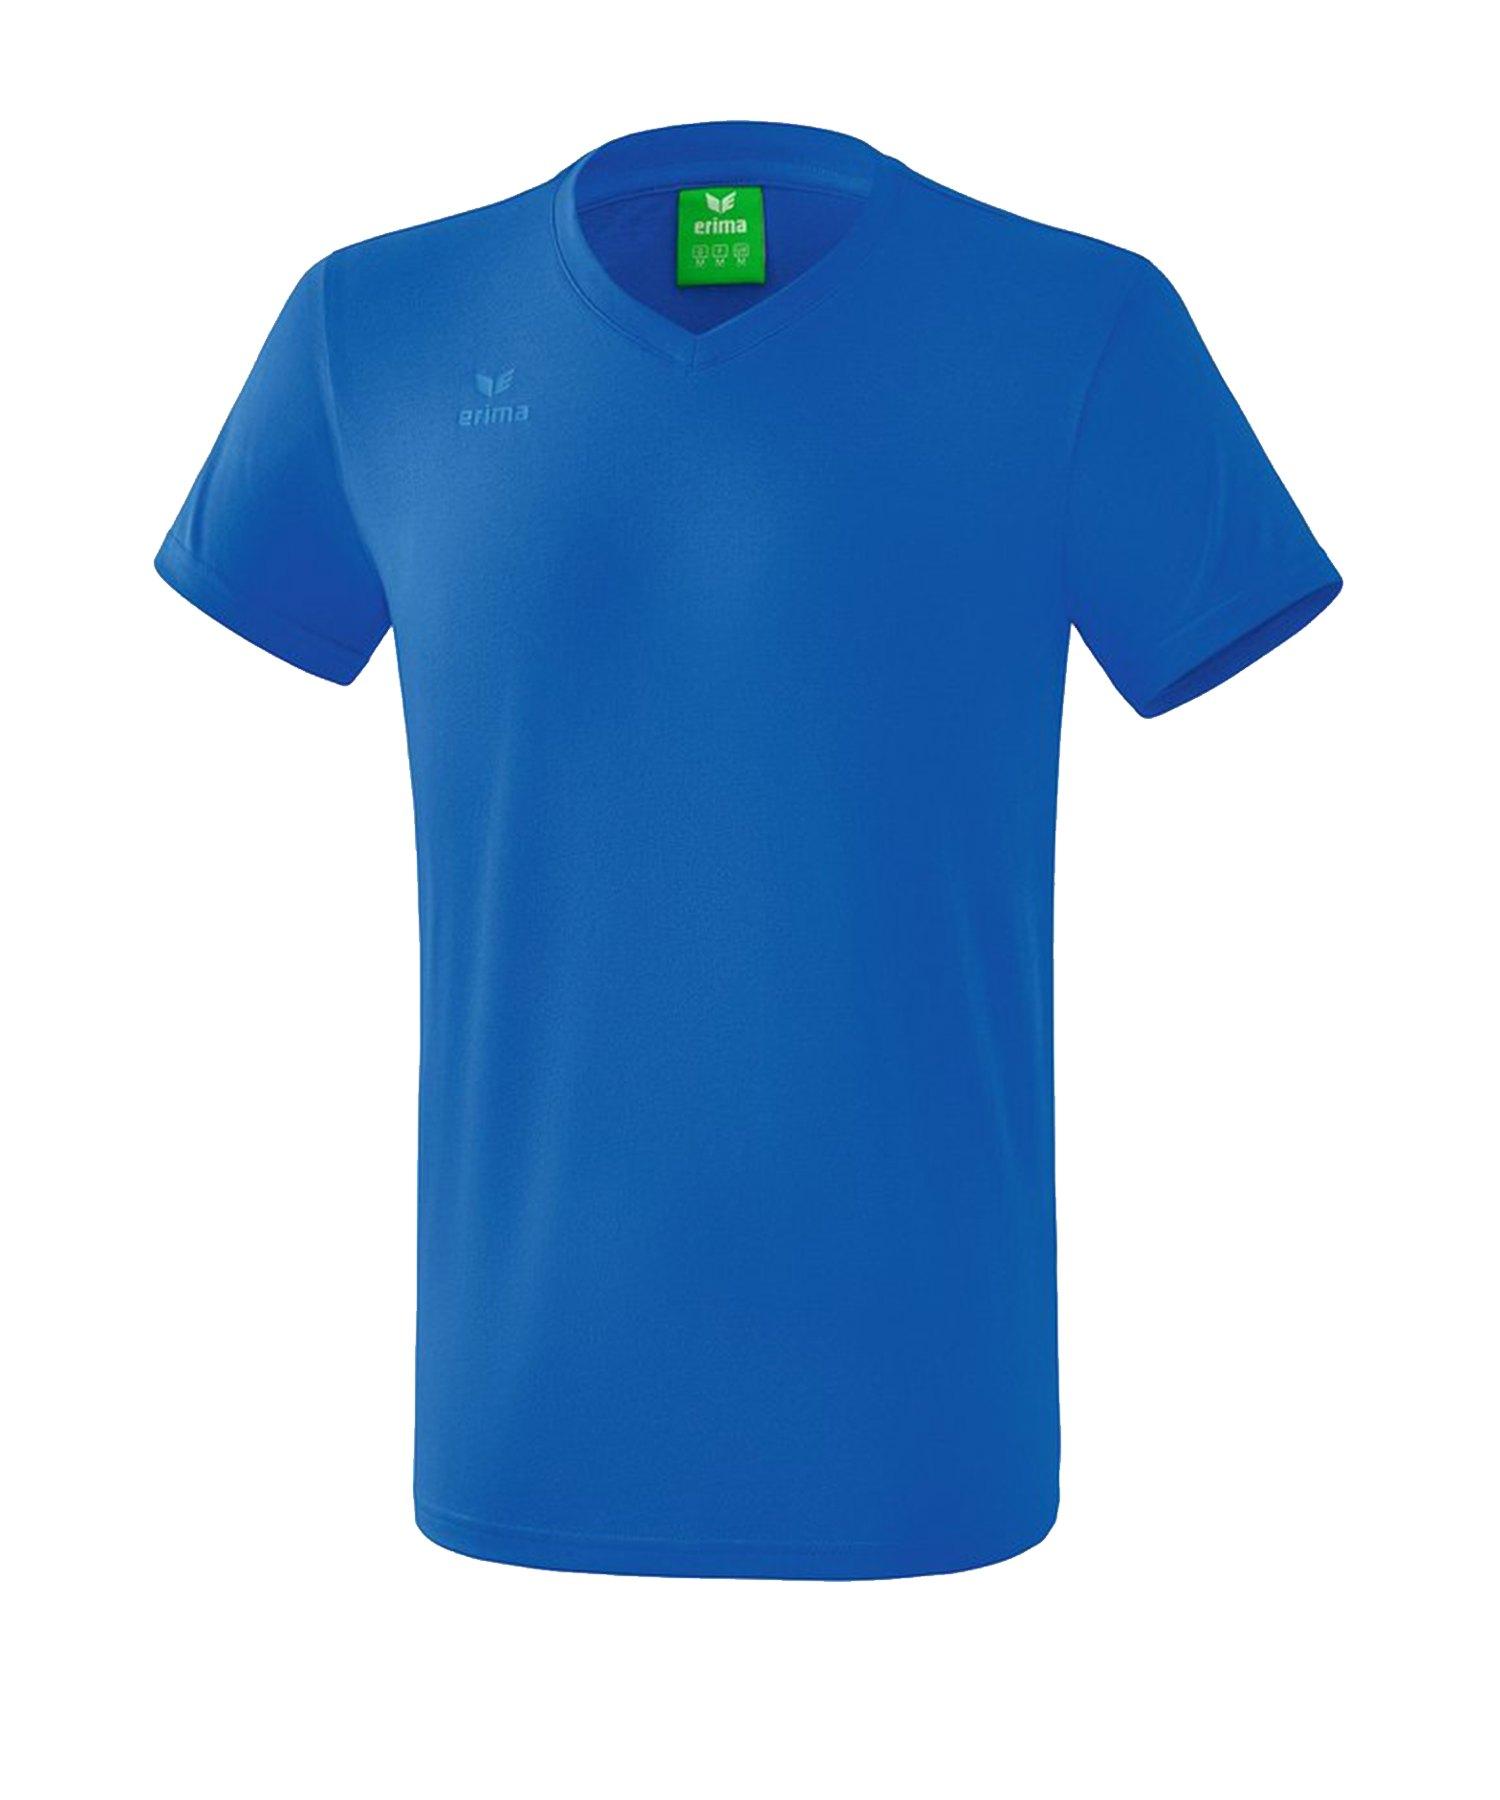 Erima Style T-Shirt Kids Blau - Blau